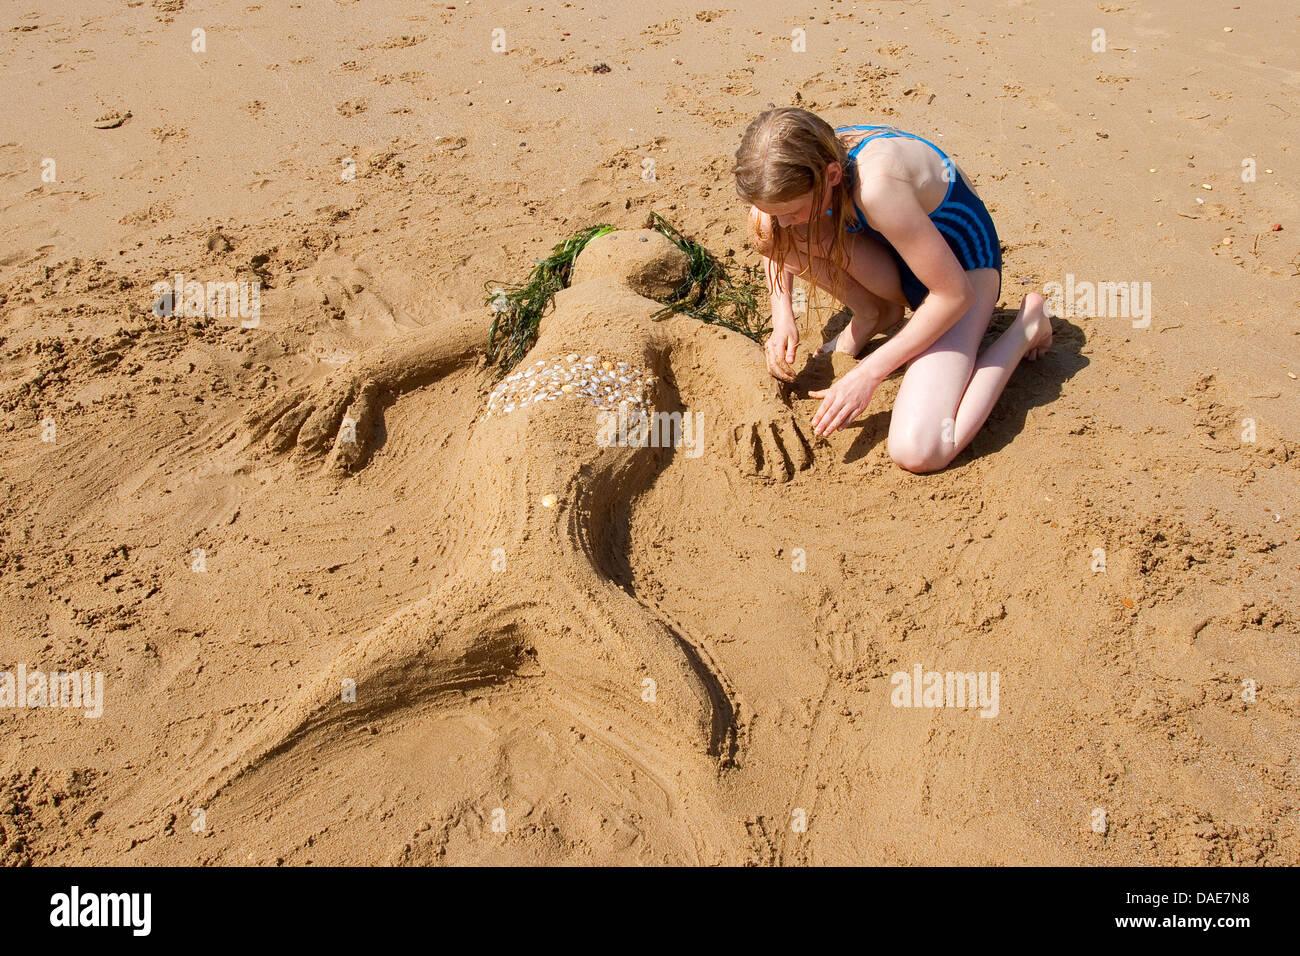 girl creating a mermaid at the mediterrian beach of Sand, seashells, little stones and algae, Italy, Sicilia - Stock Image